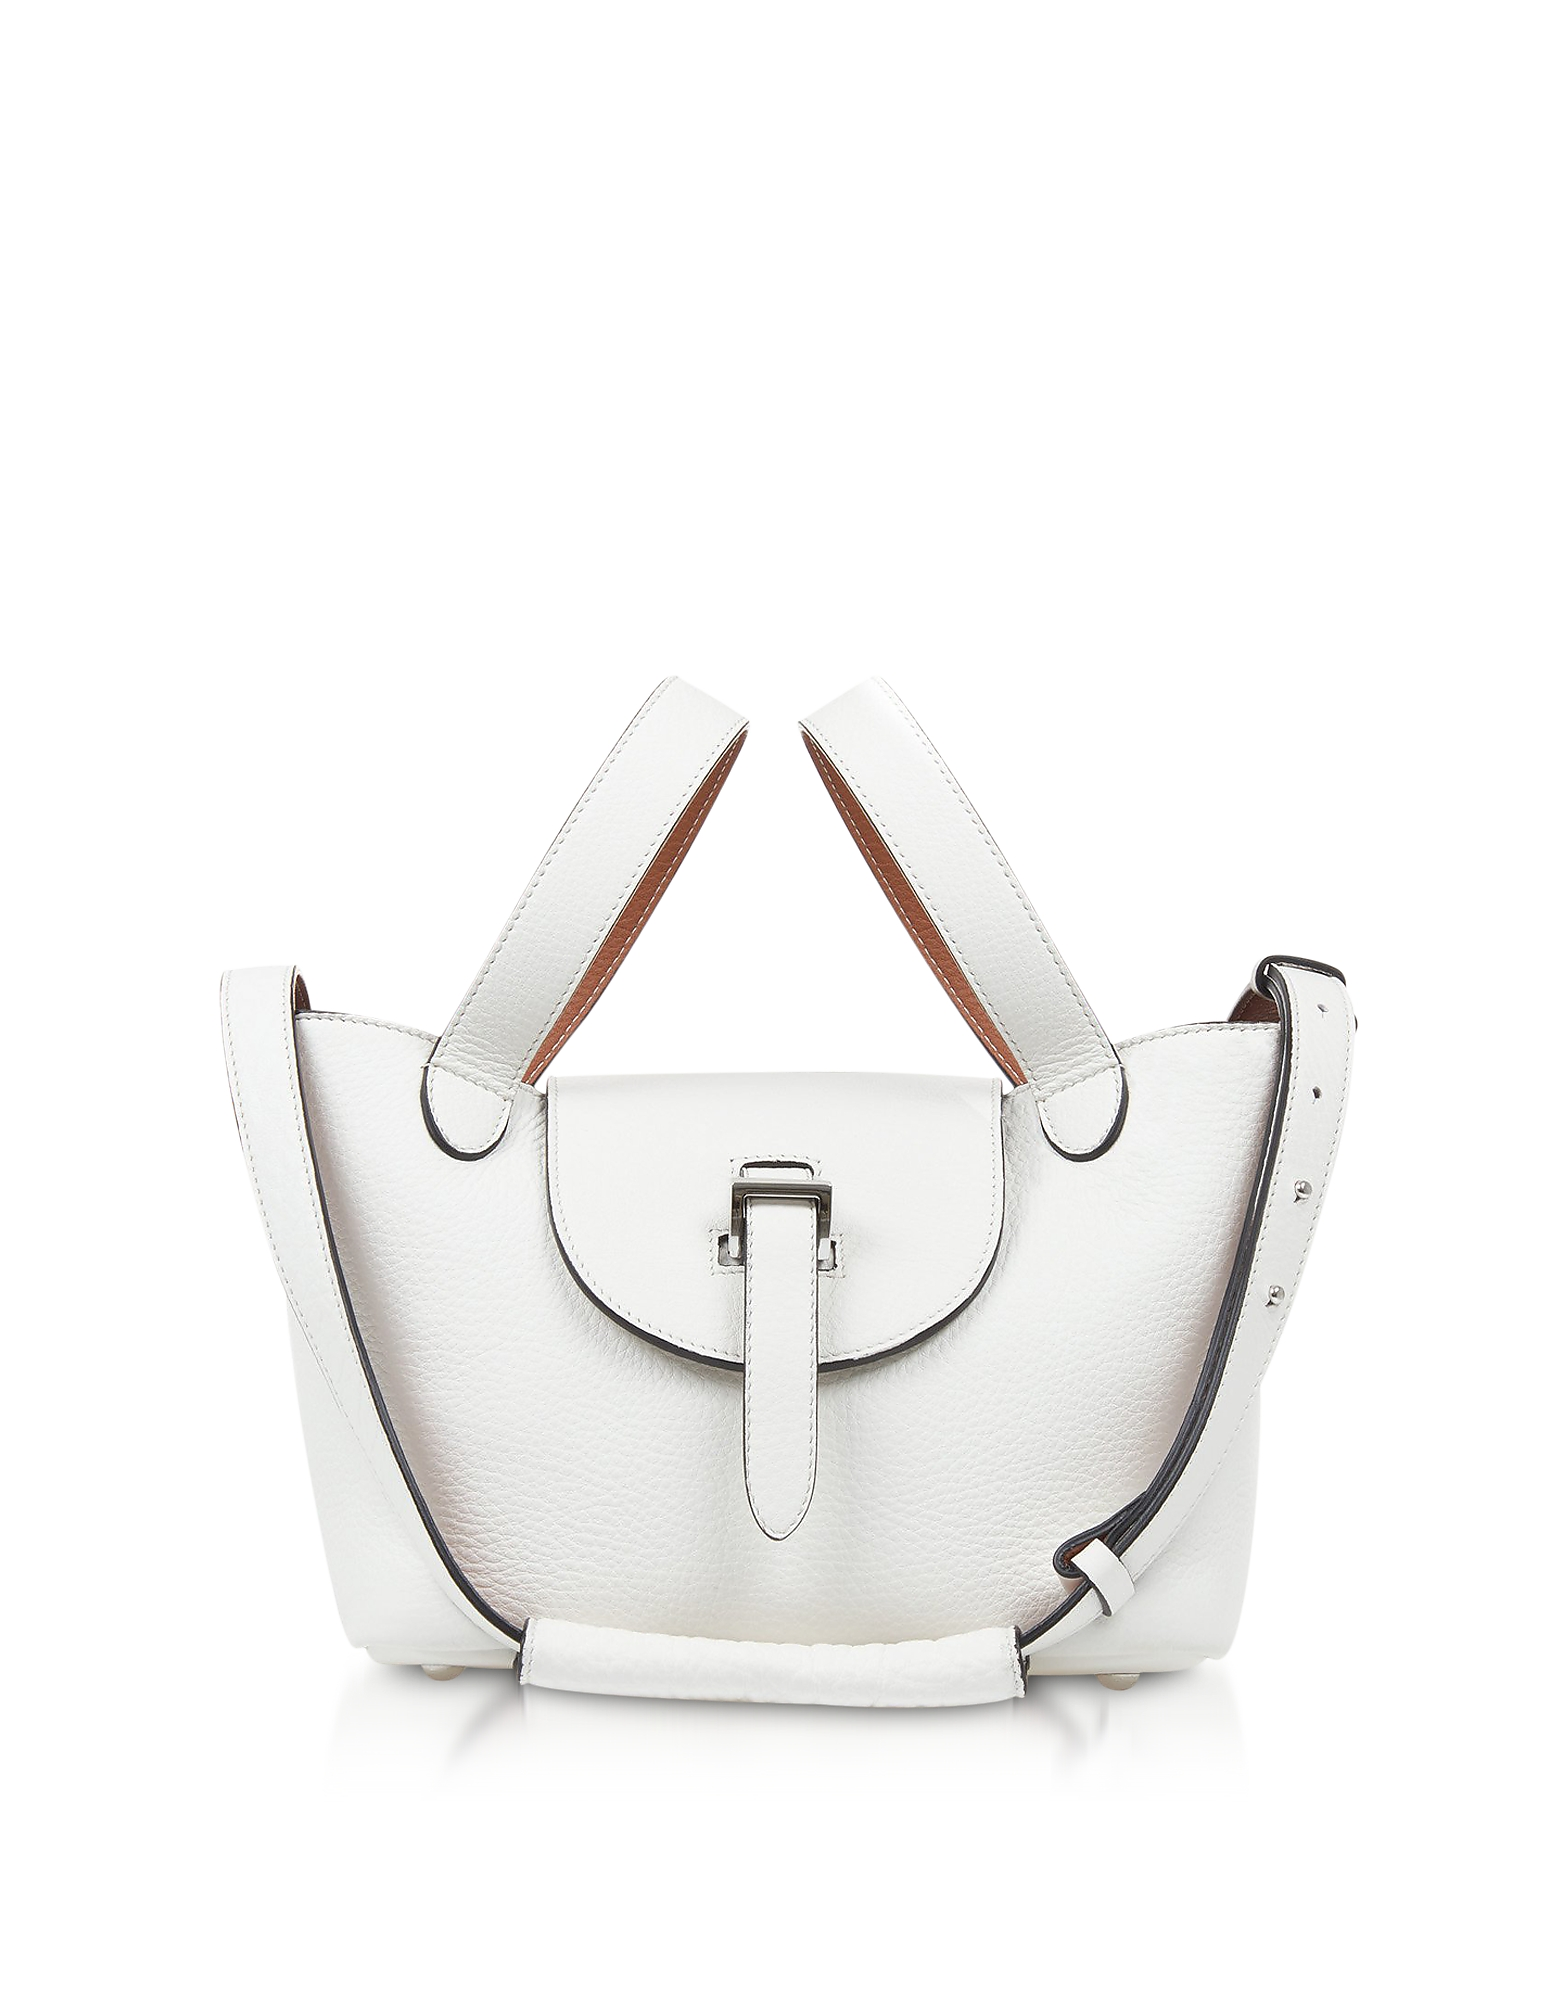 Image of Meli Melo Designer Handbags, White/Tan Thela Mini Tote Bag